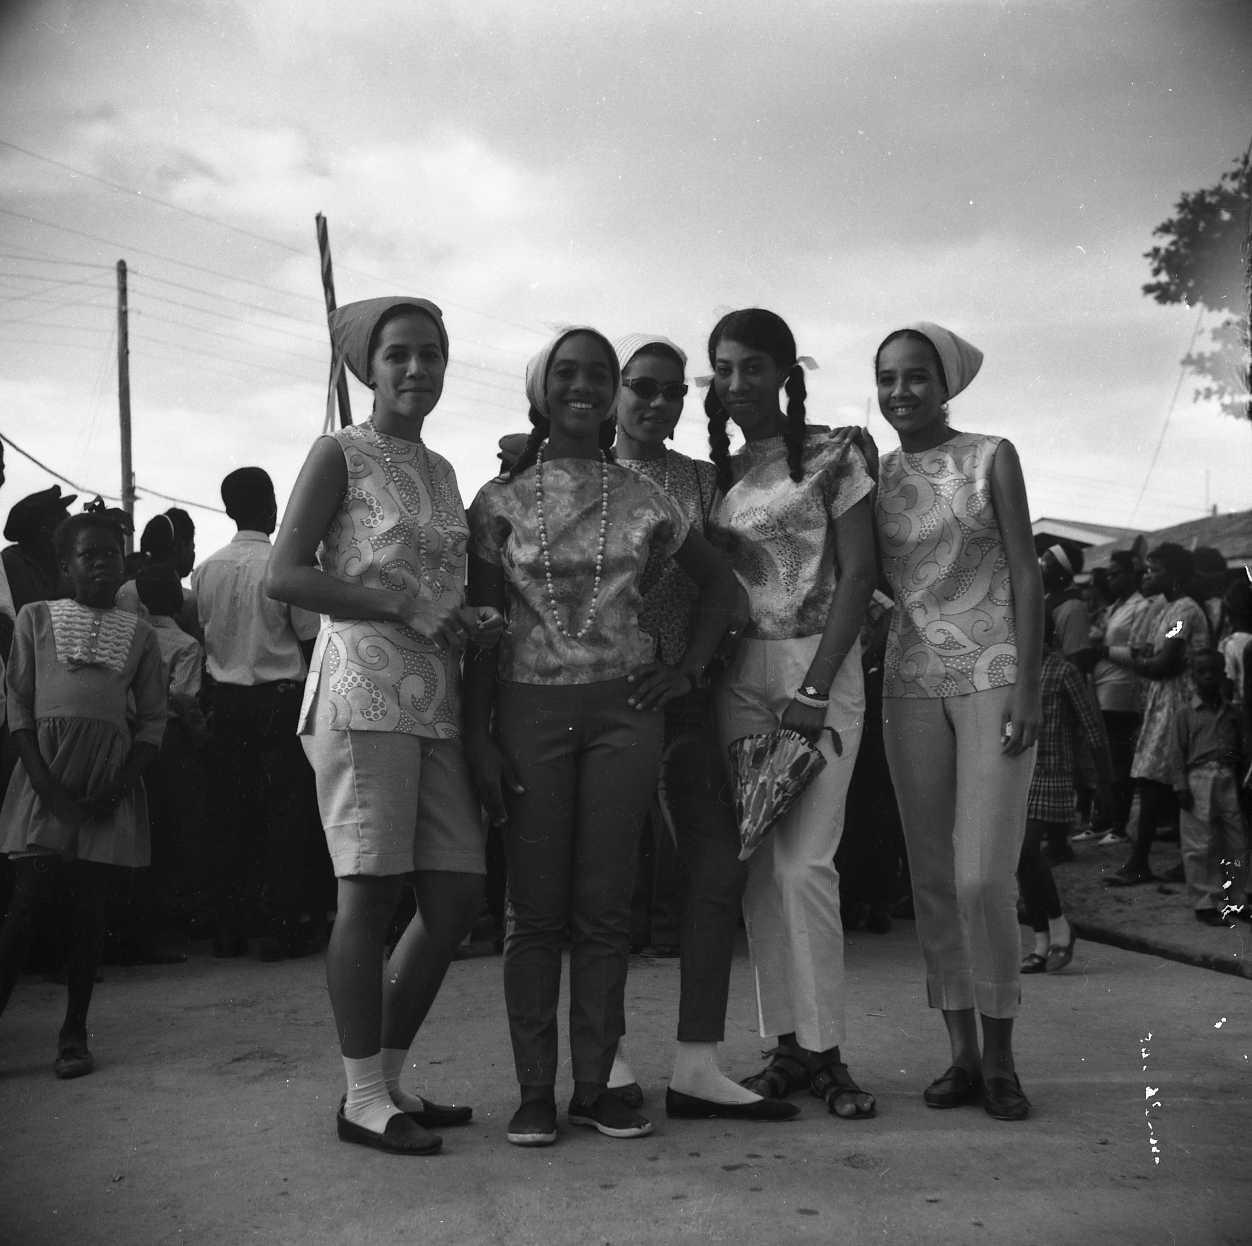 Windward ladies at Carriacou Carnival.